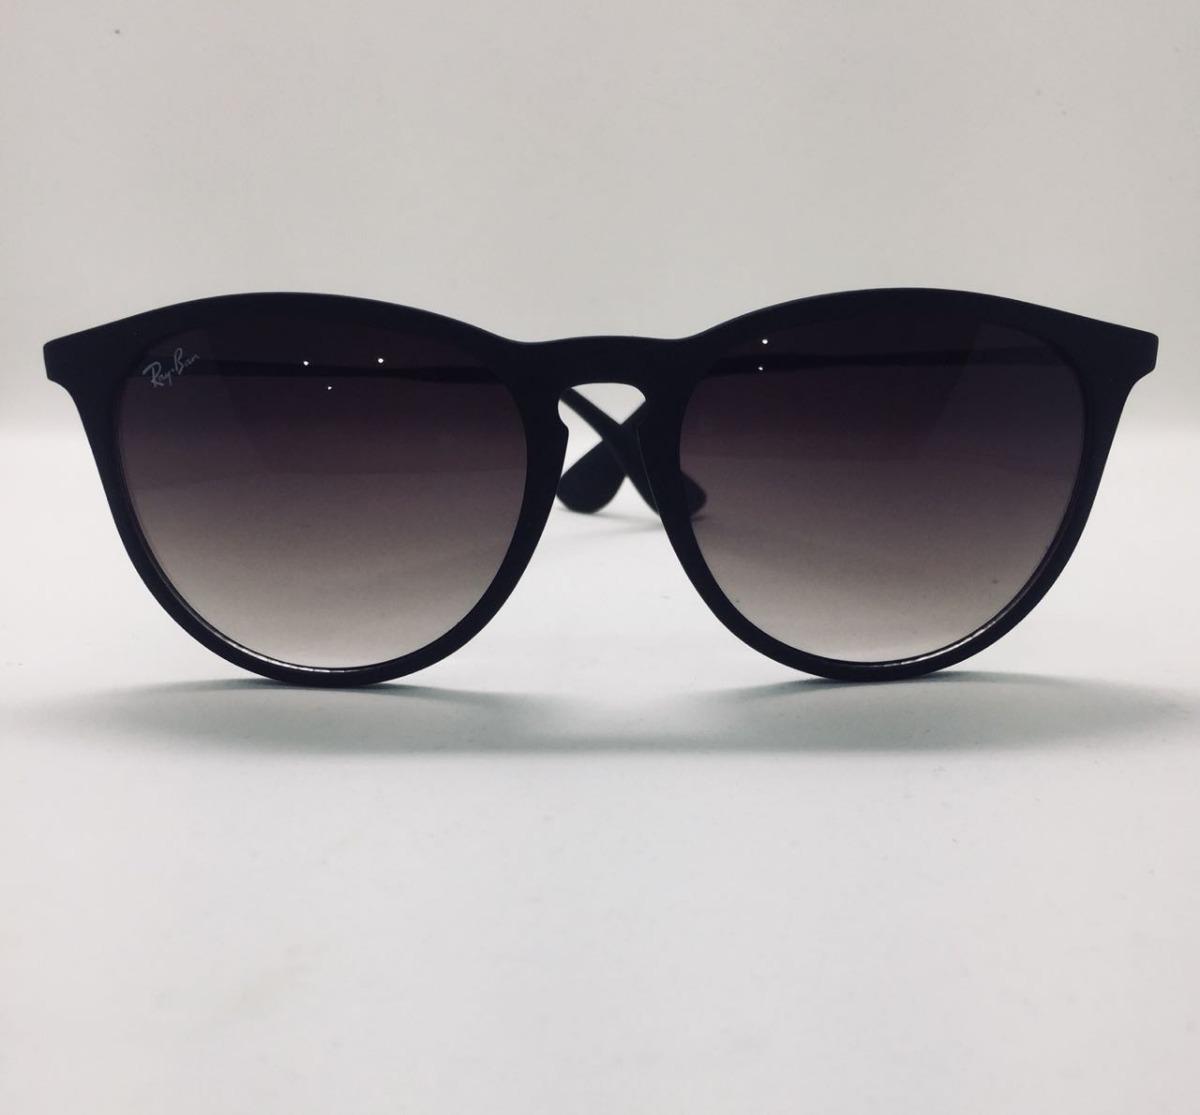 dc19bb1683 óculos ray-ban novo e original 4171 erika. Carregando zoom.